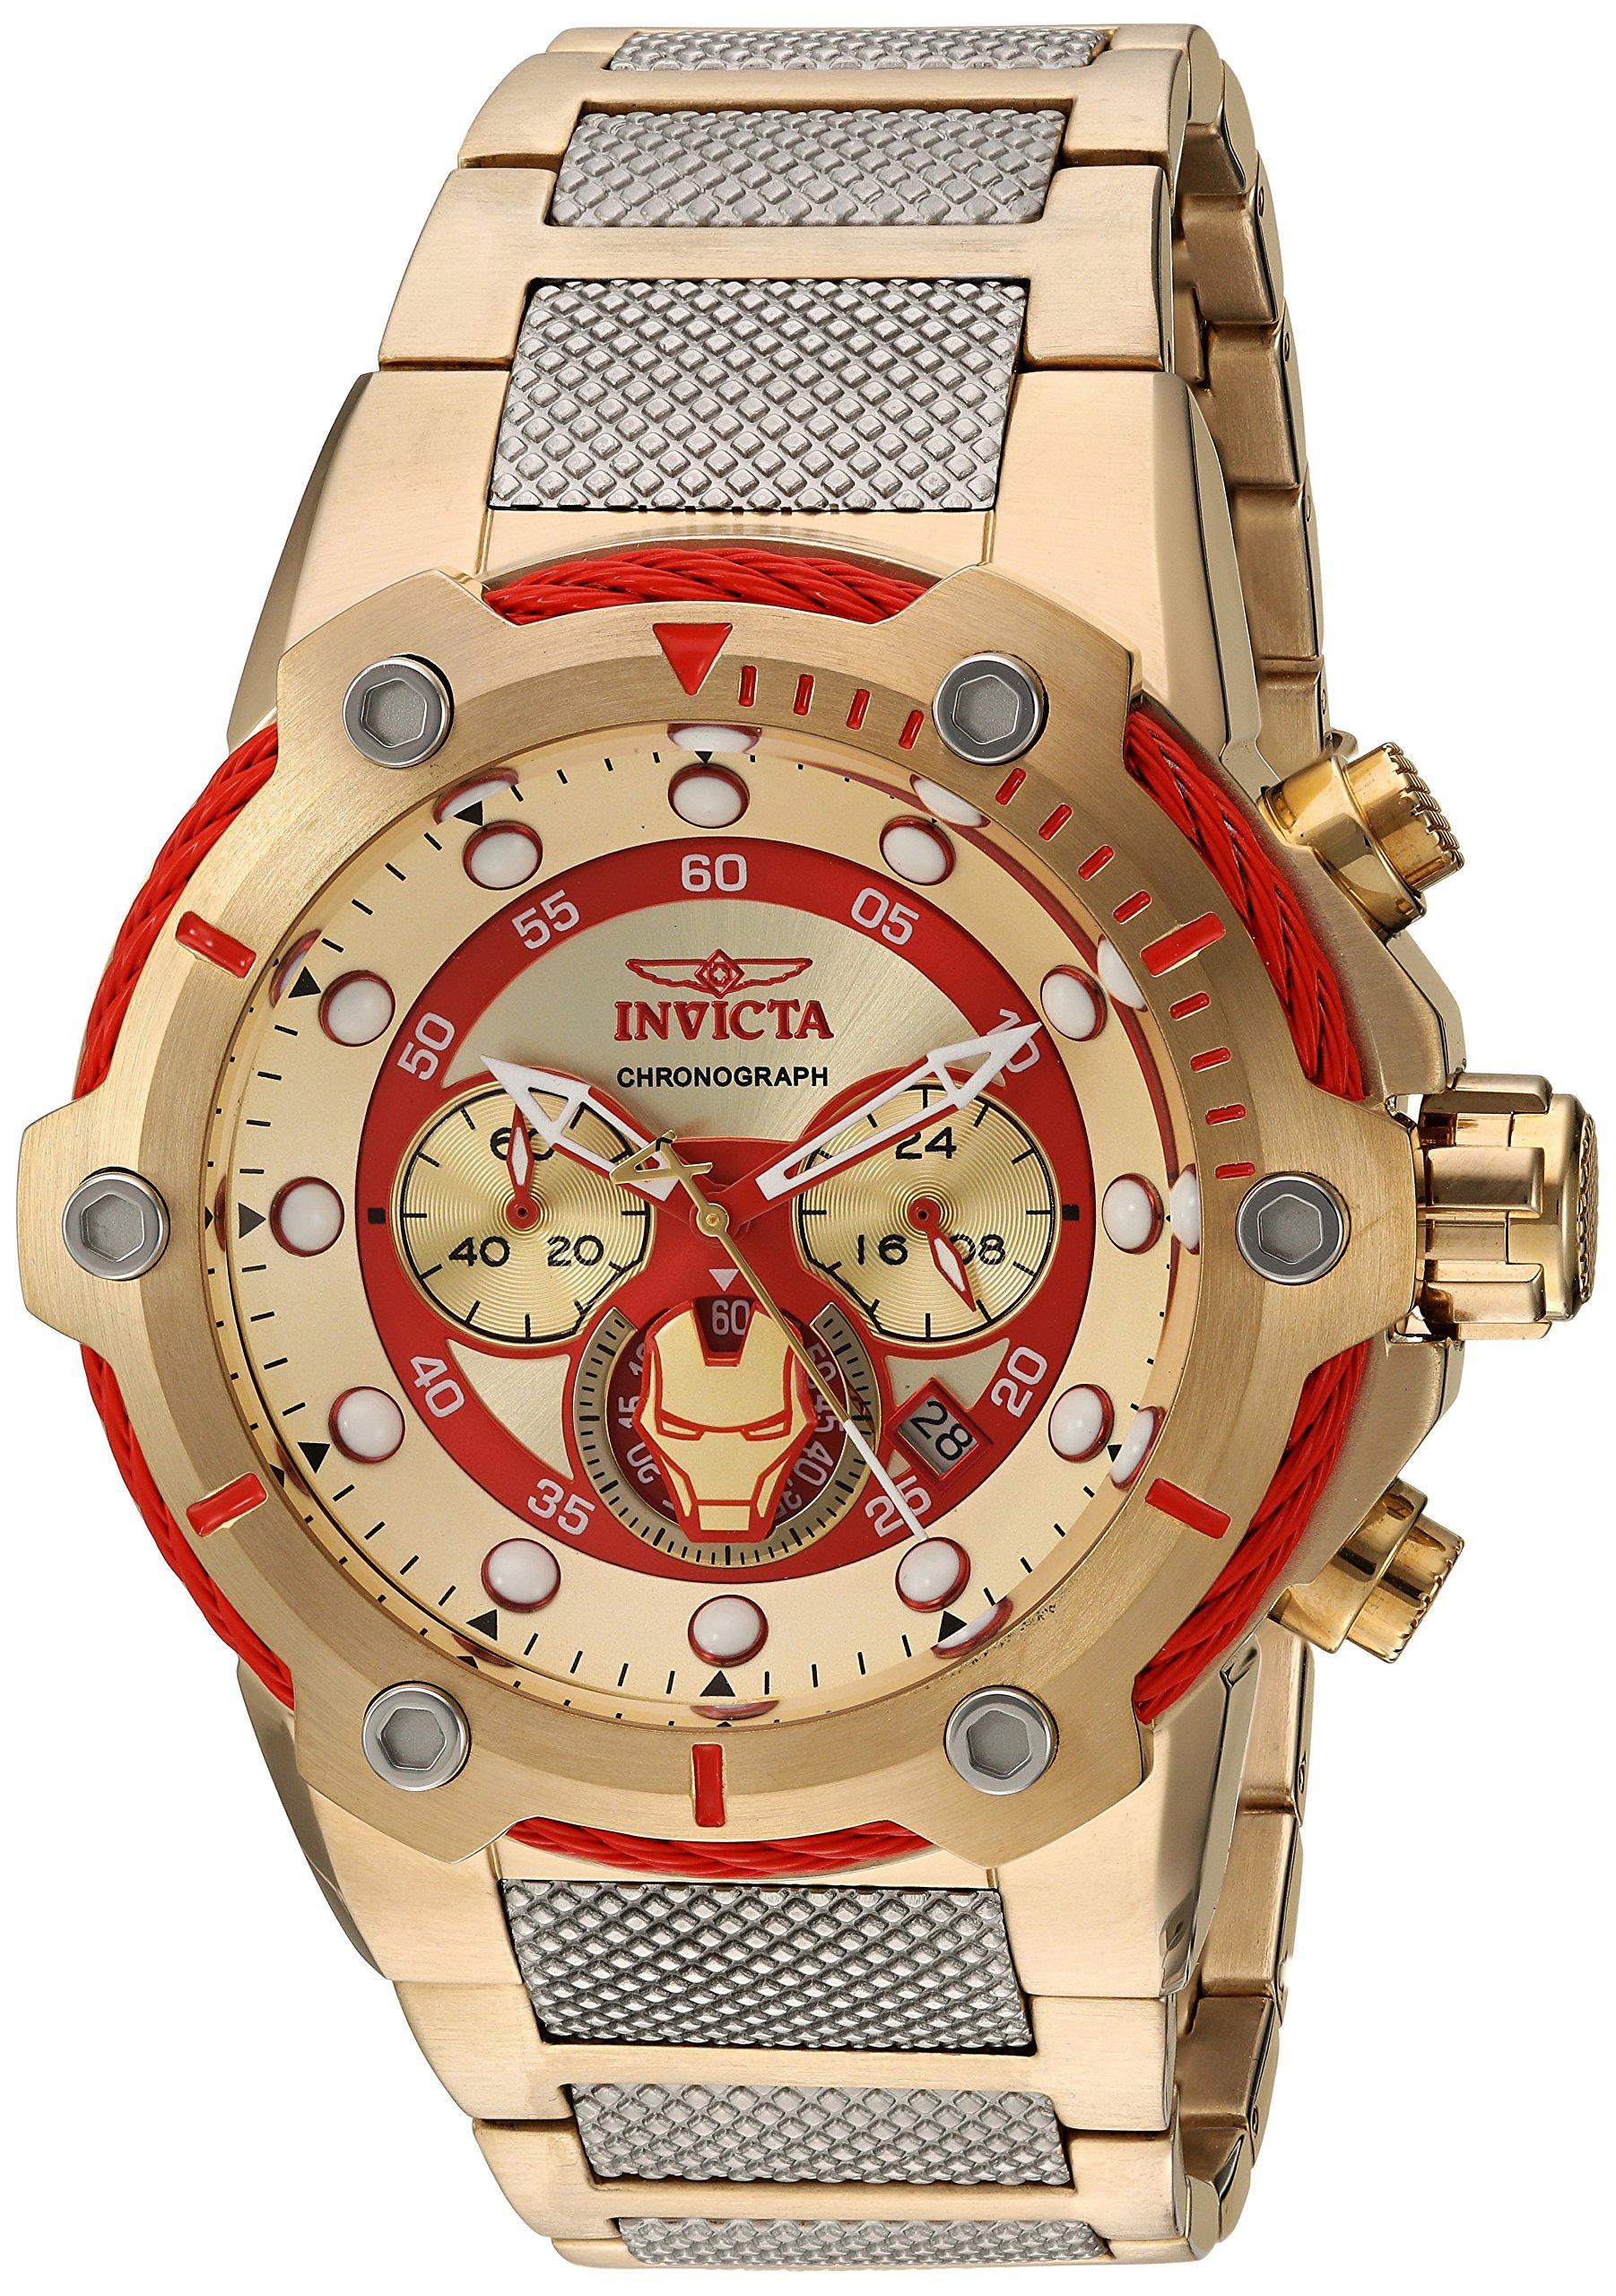 ویکالا · خرید  اصل اورجینال · خرید از آمازون · Invicta Marvel Iron Man Edition Gold Dial Chronograph Stainless Steel Men's Watch 25781 wekala · ویکالا